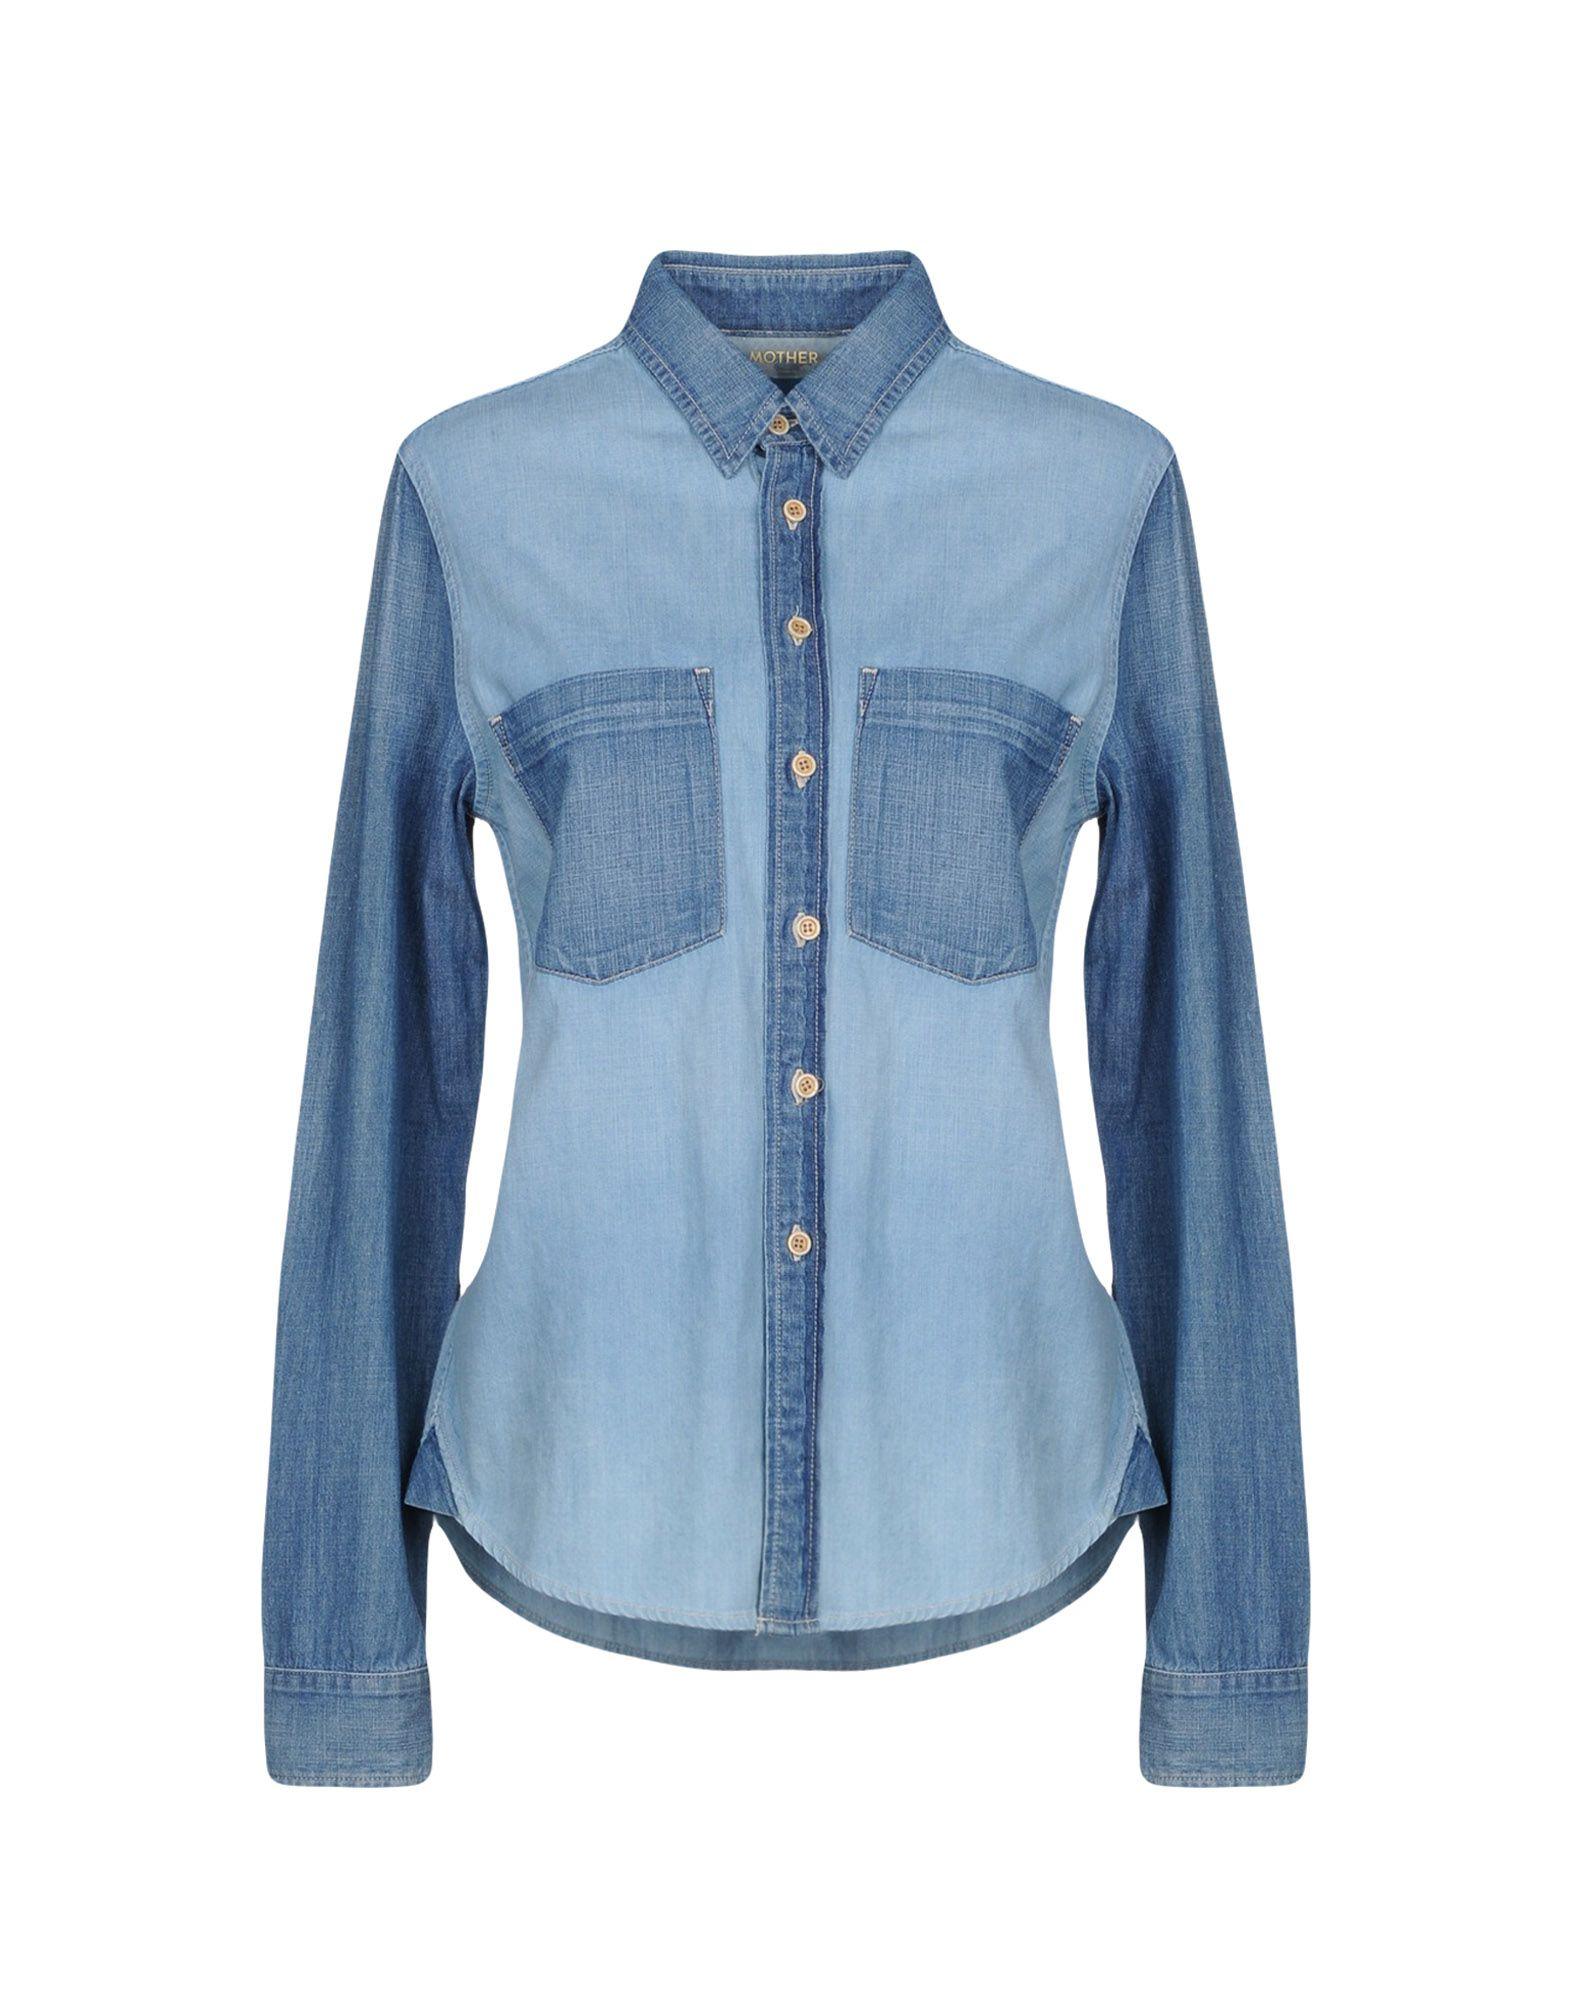 MOTHER Джинсовая рубашка legrand 61765 page 4